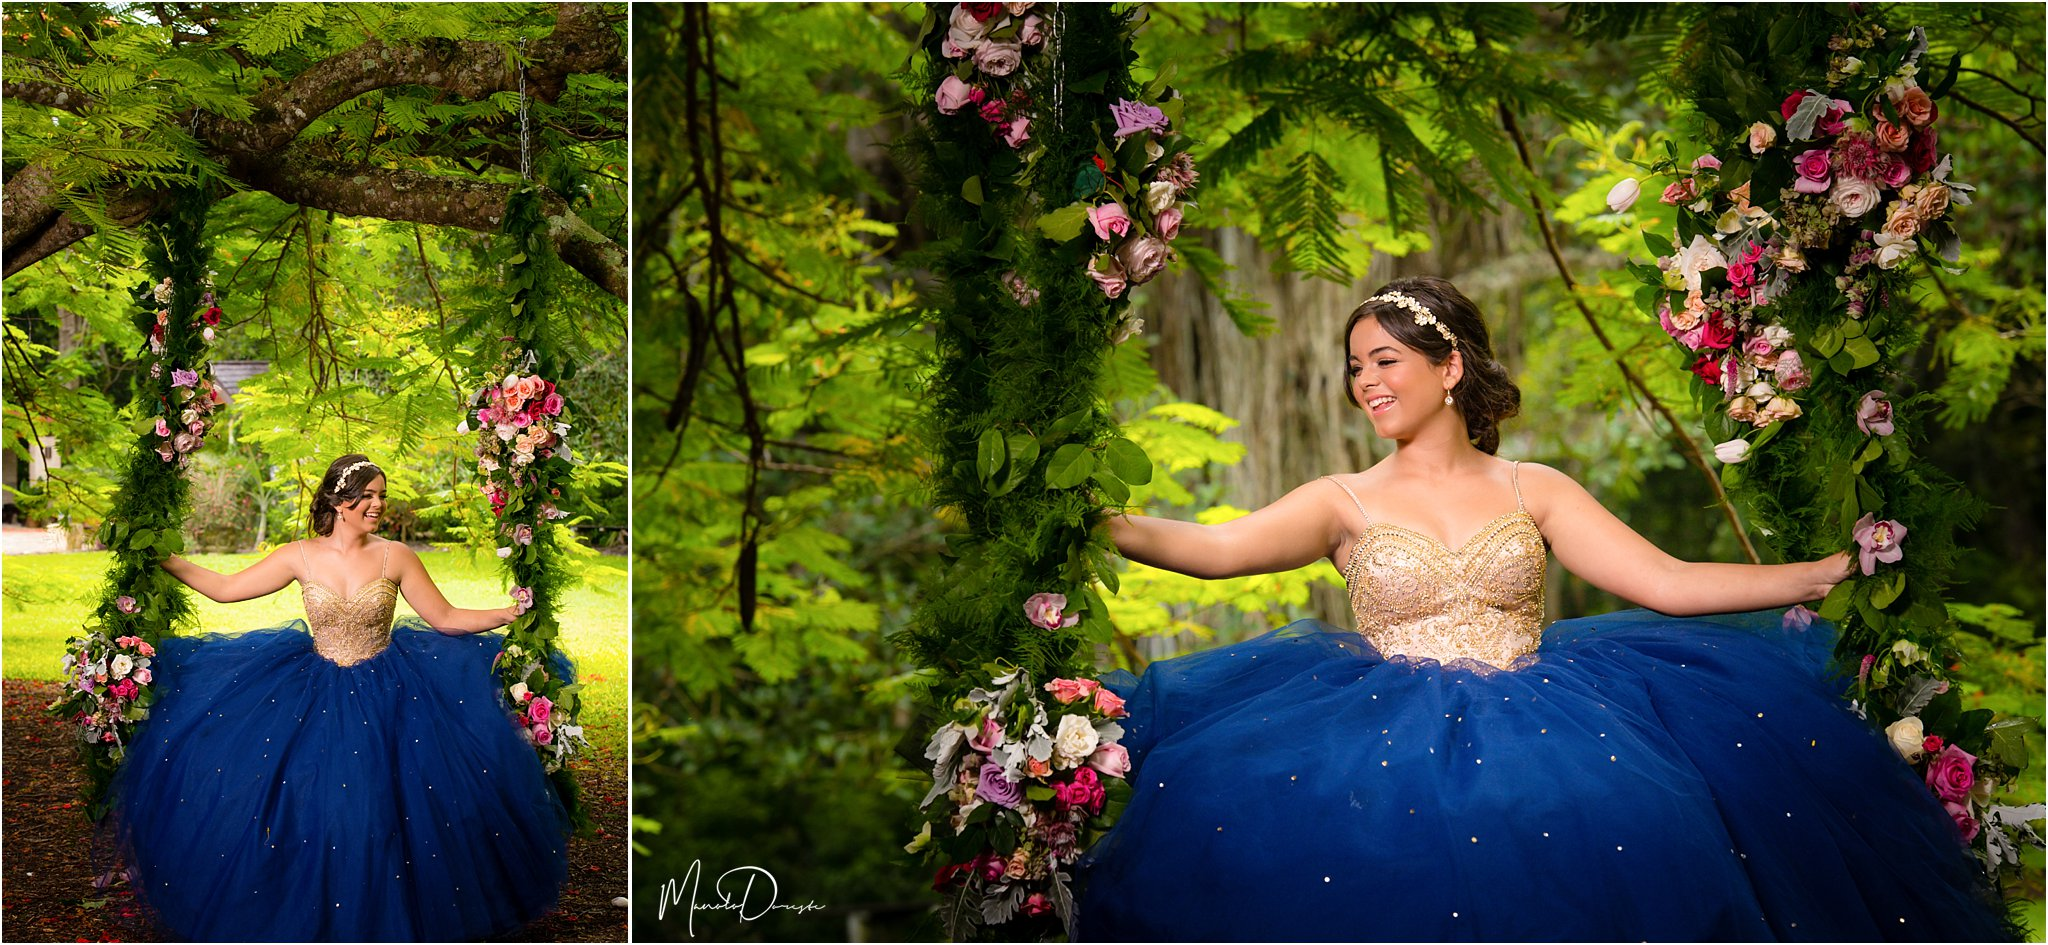 0337_ManoloDoreste_InFocusStudios_Wedding_Family_Photography_Miami_MiamiPhotographer.jpg